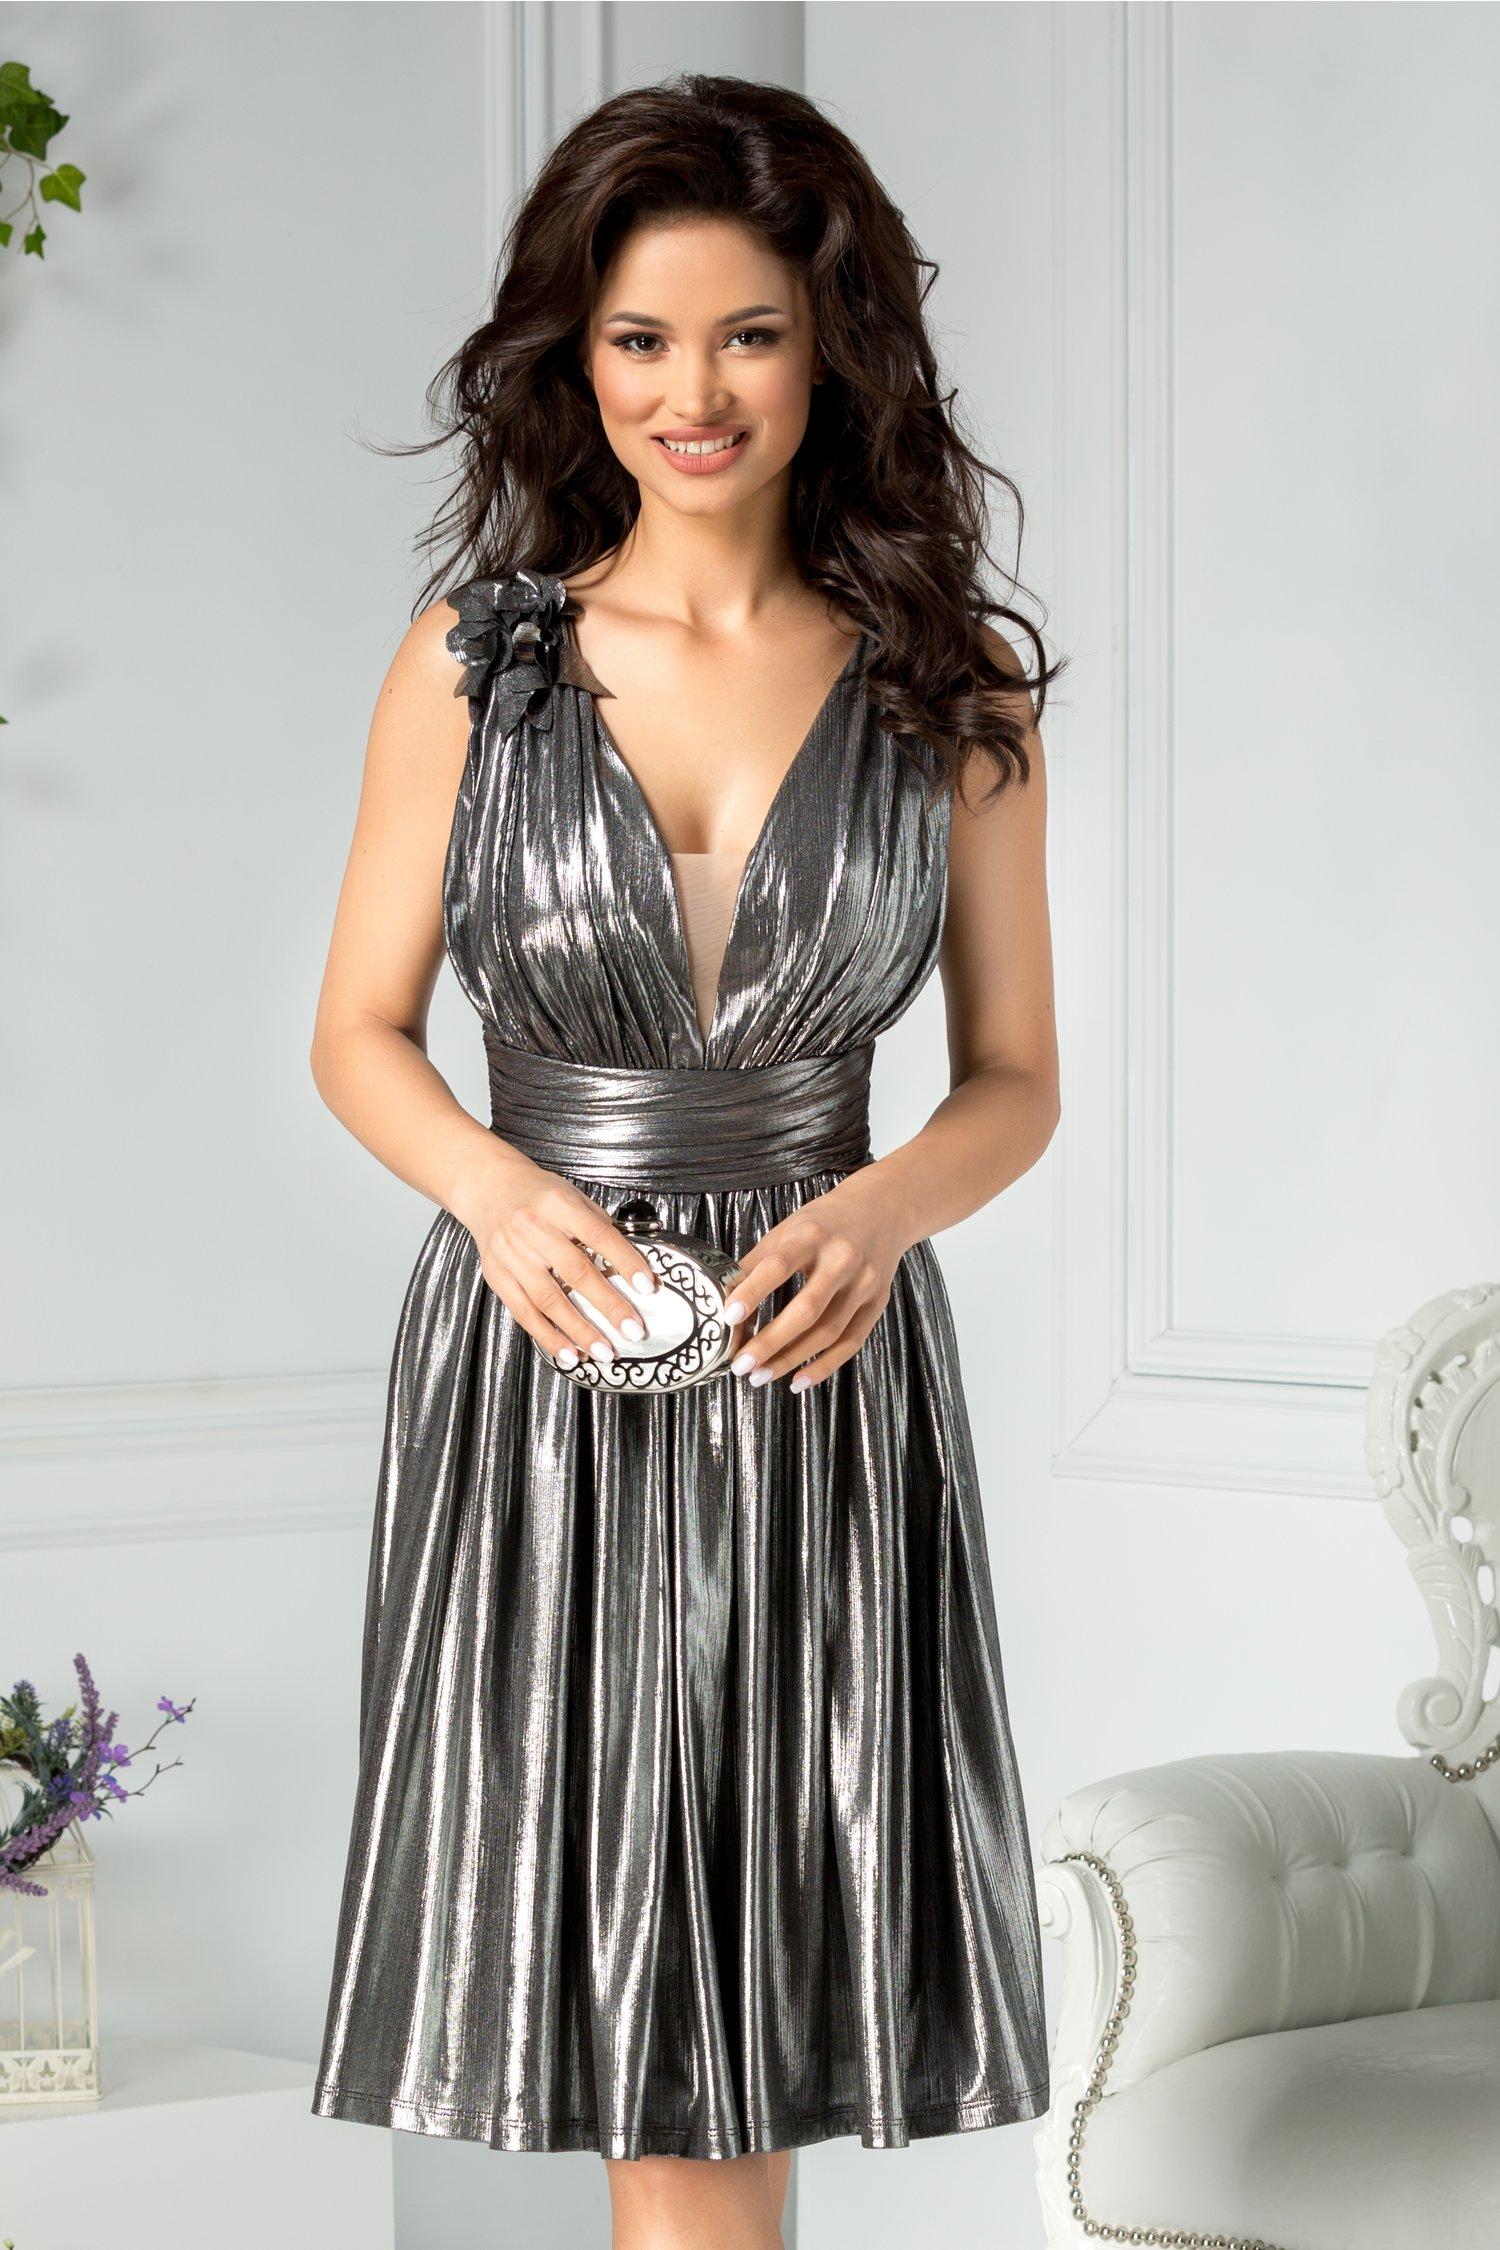 Rochie Ladonna Brigitta midi de ocazie argintiu metalizat